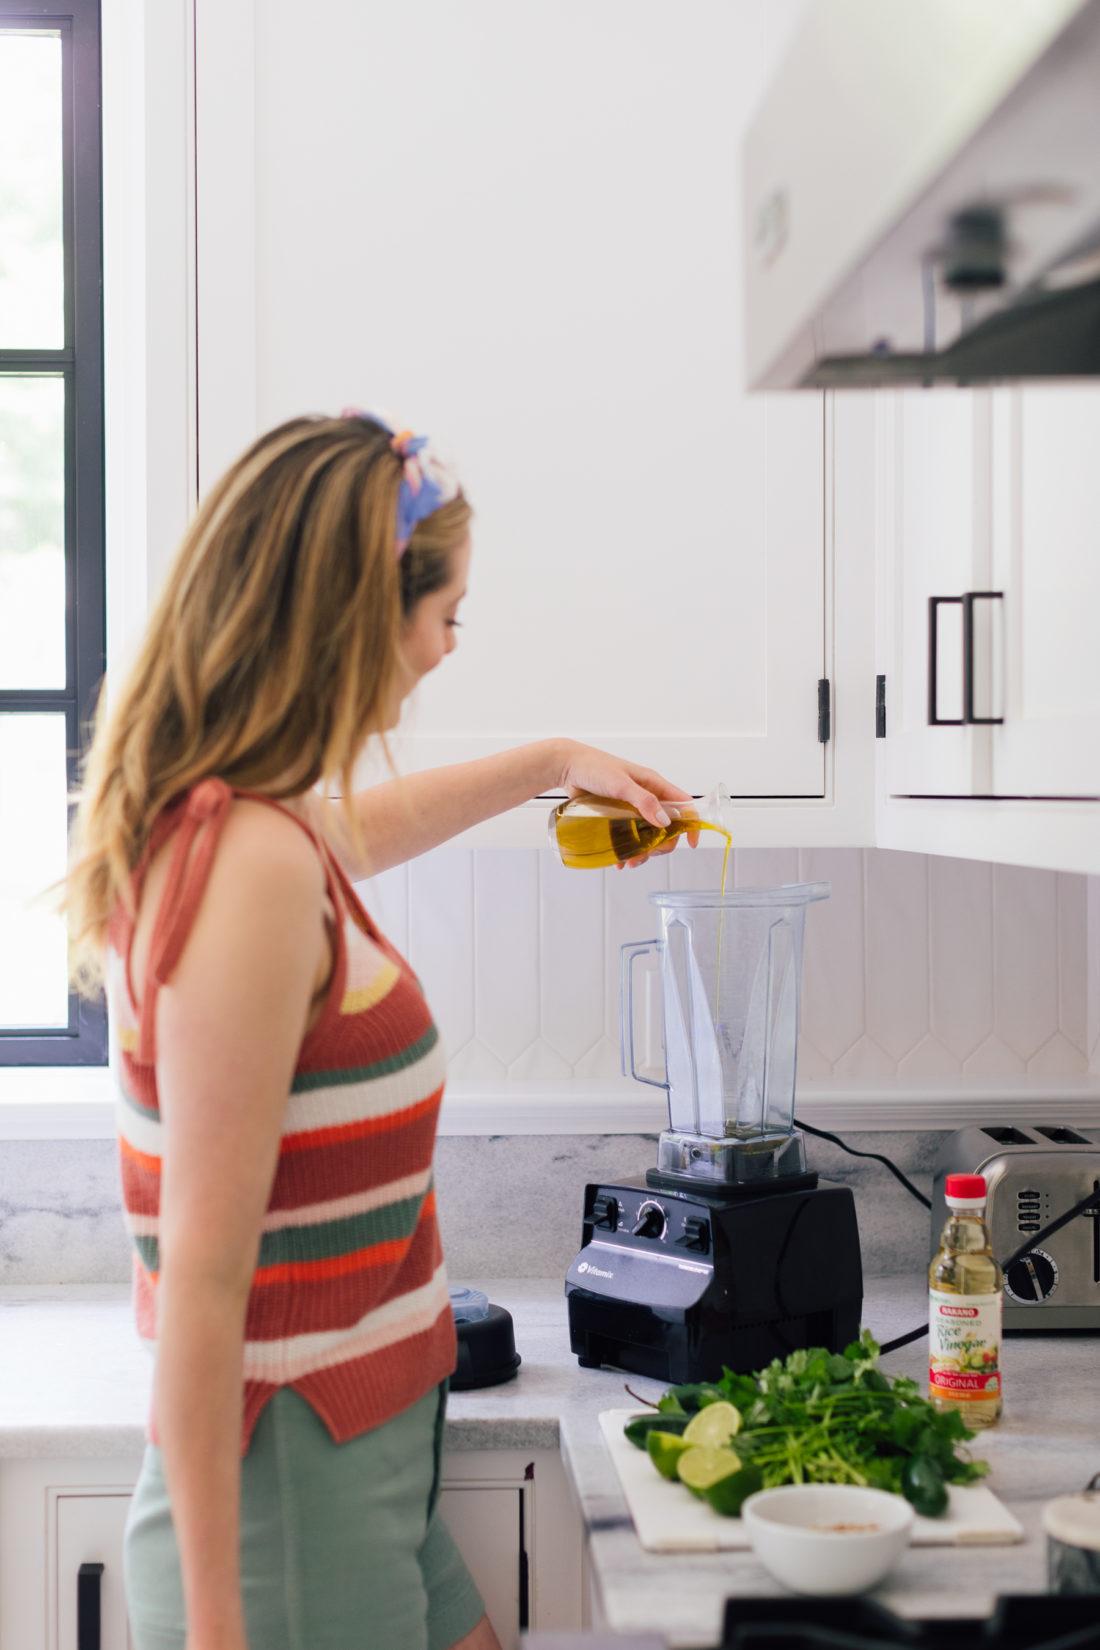 Eva Amurri Martino makes the vinaigrette for Buster's Famous Green Fish recipe